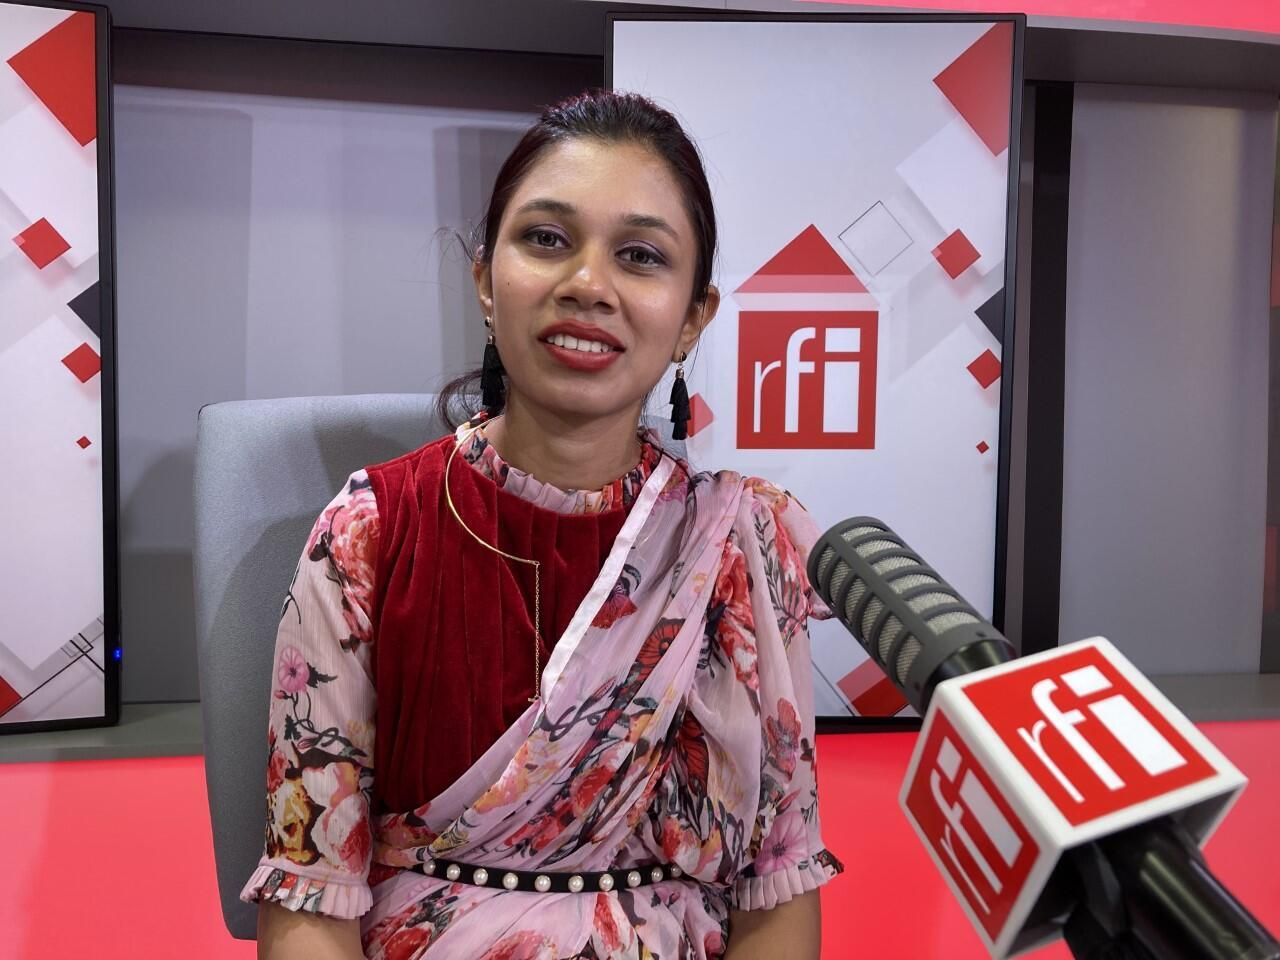 Adita Prithika Subramanian_president of the RFI listeners' club Agnichiragu Phoenix_Tirupur_Tamil Nadu_India_Sept 2021